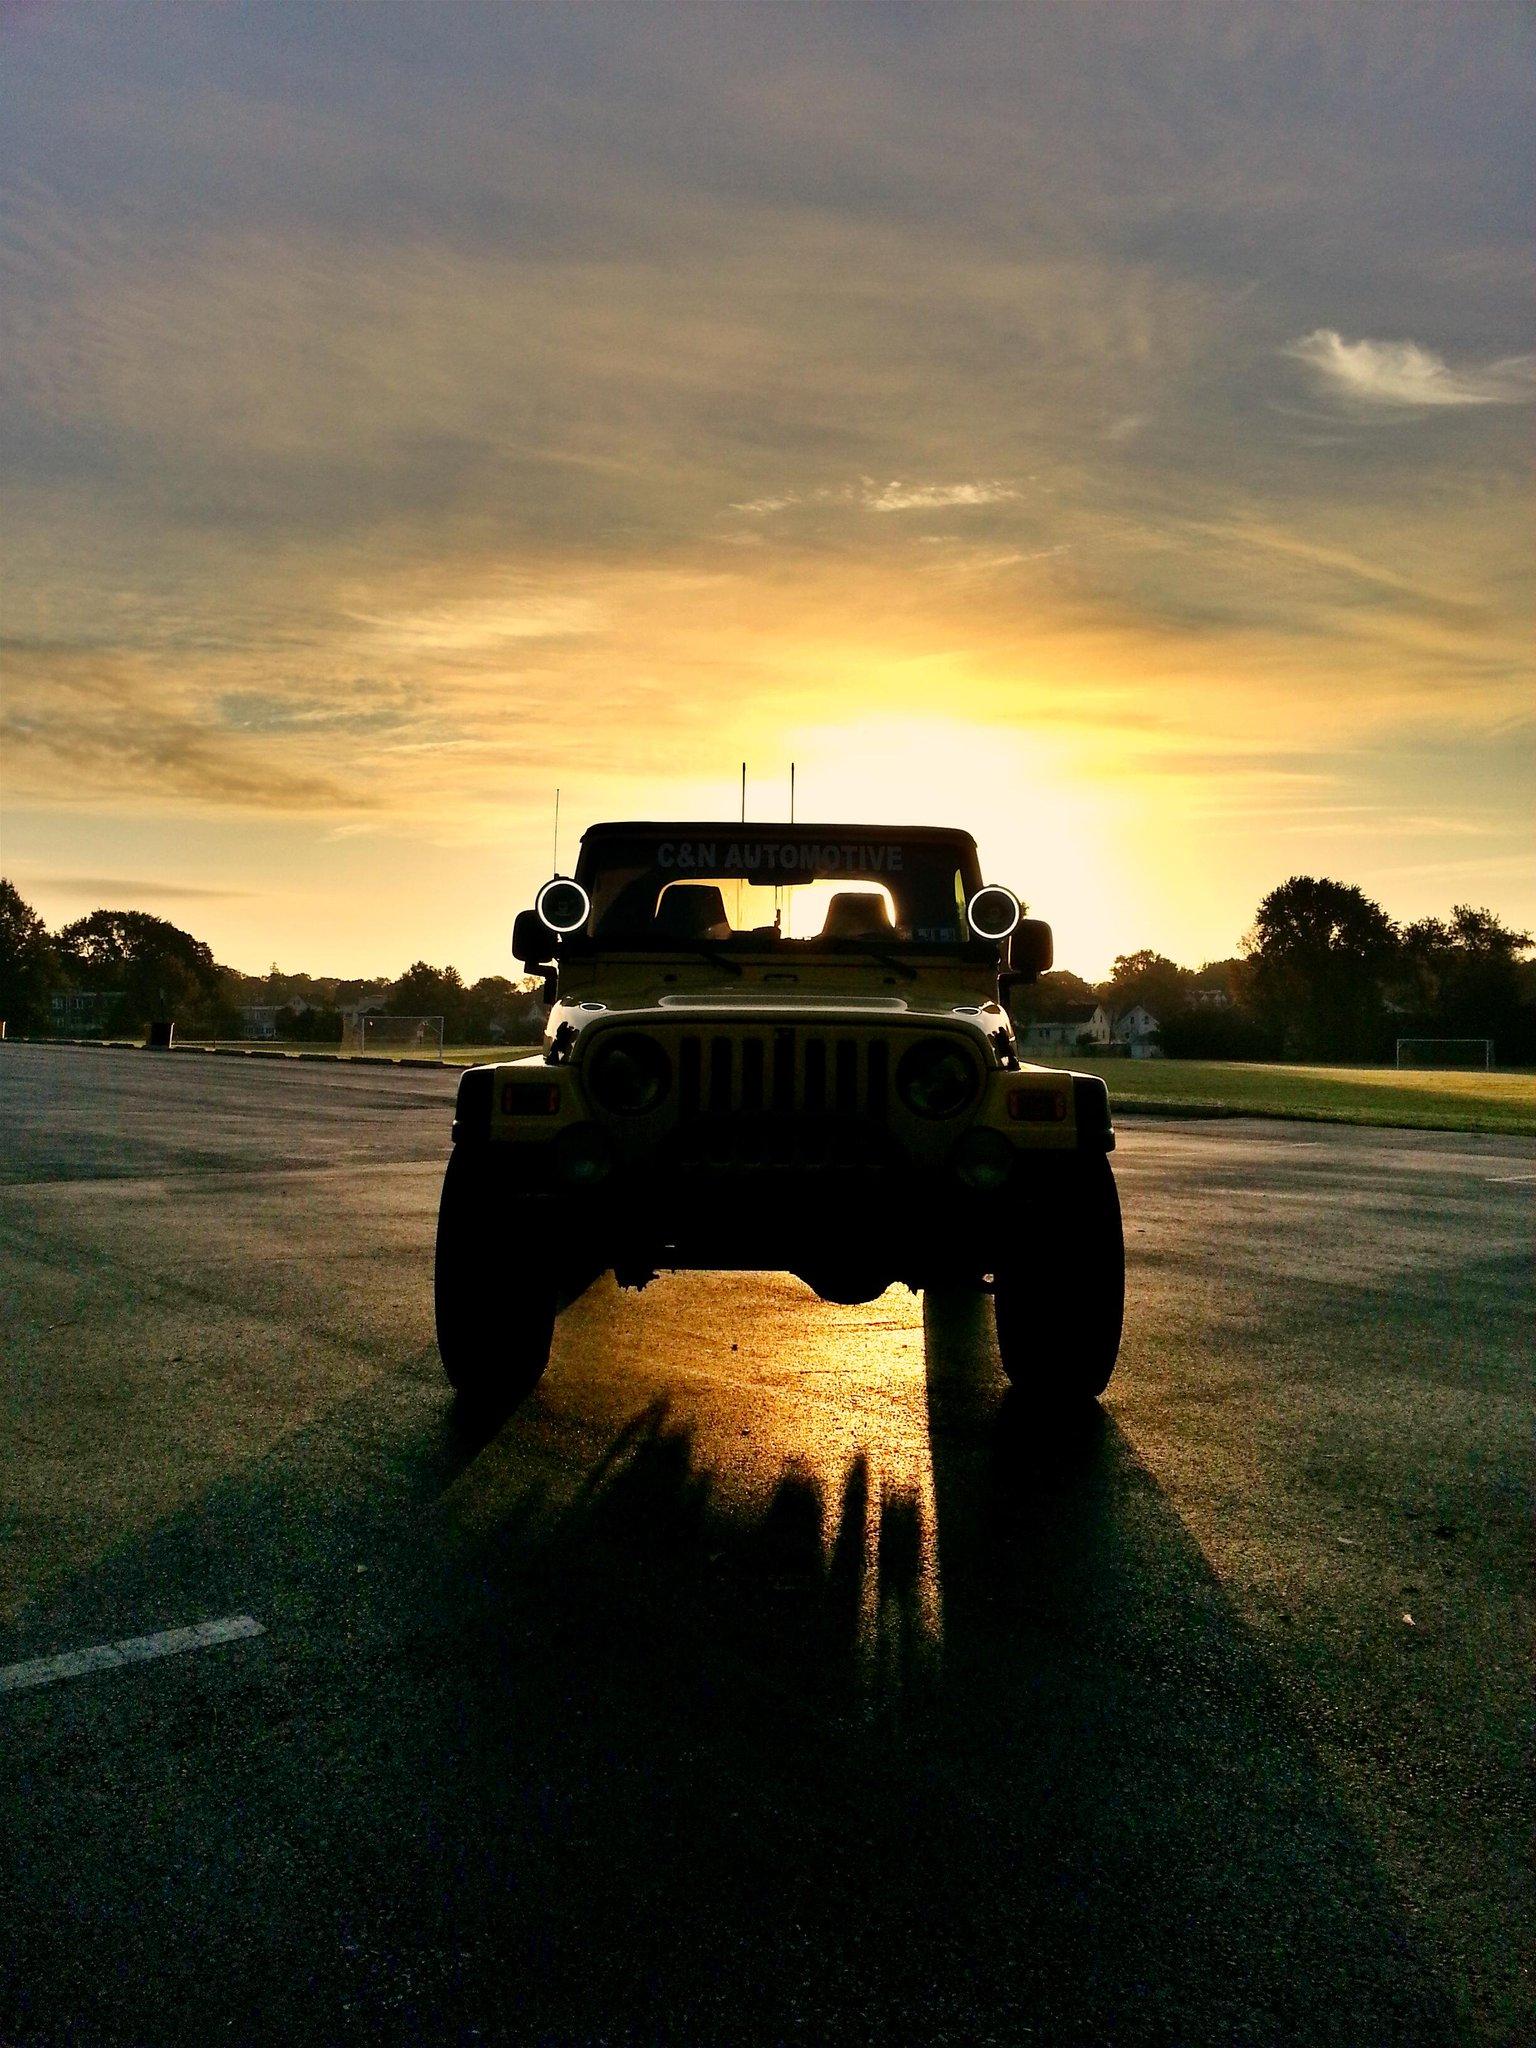 RT @nickigaulin34: @JeepWorld jeeps make a sunrise better http://t.co/wAjDPJ2yFA